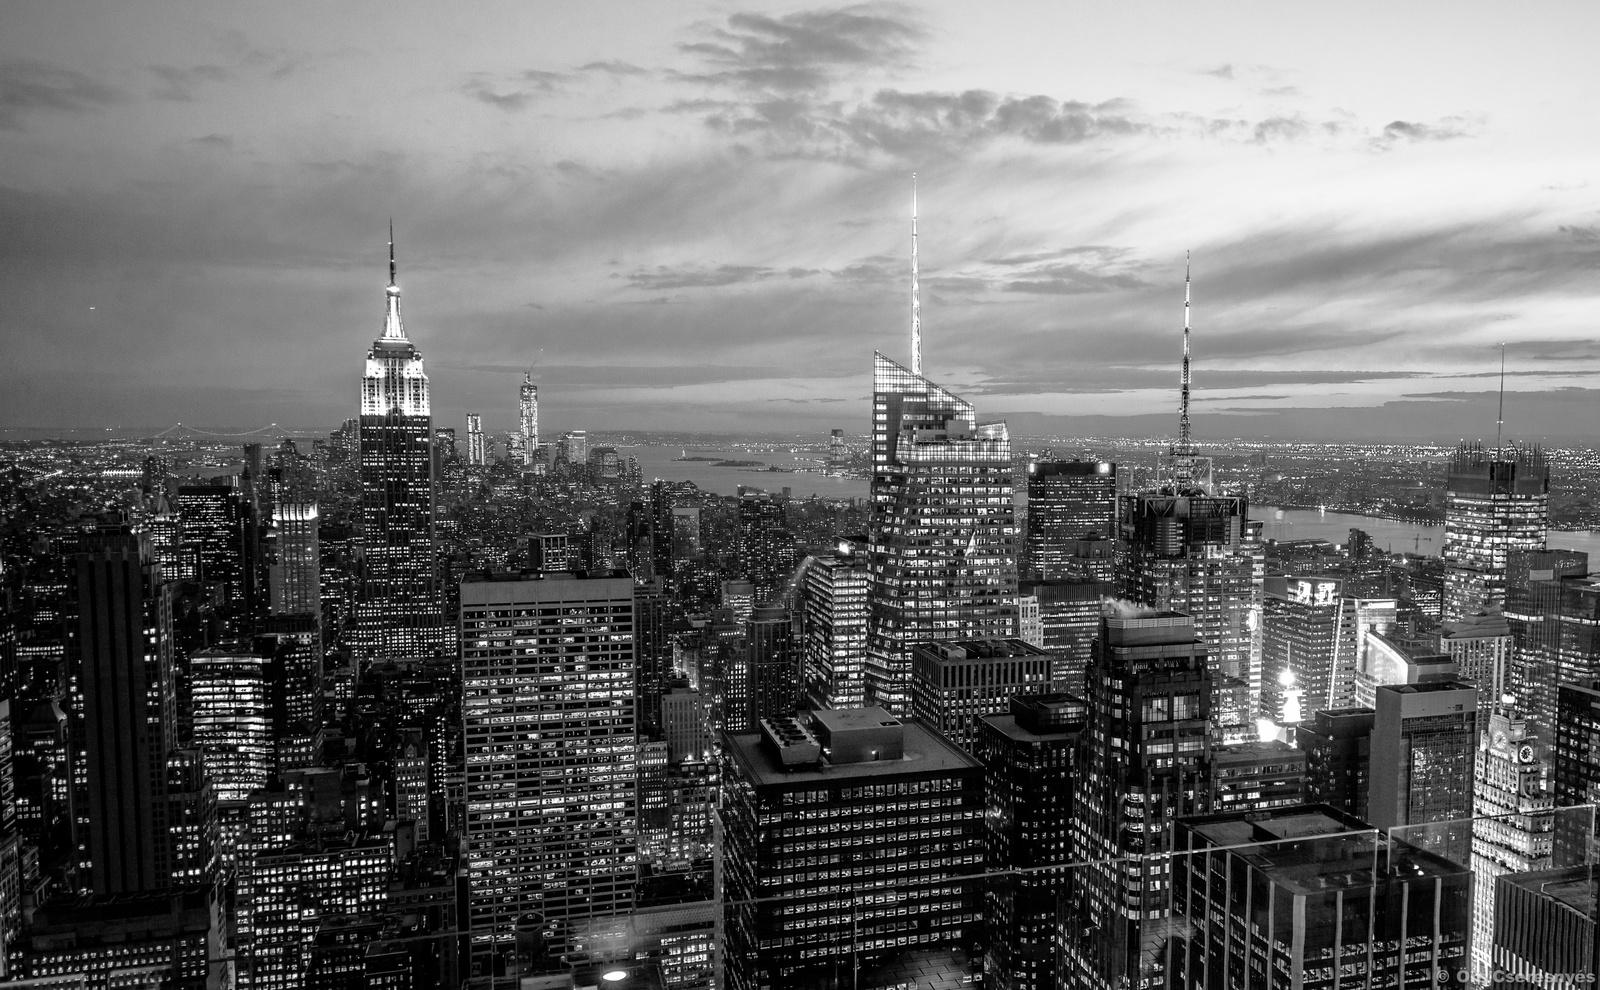 ors.cseresnyes: BW NYC